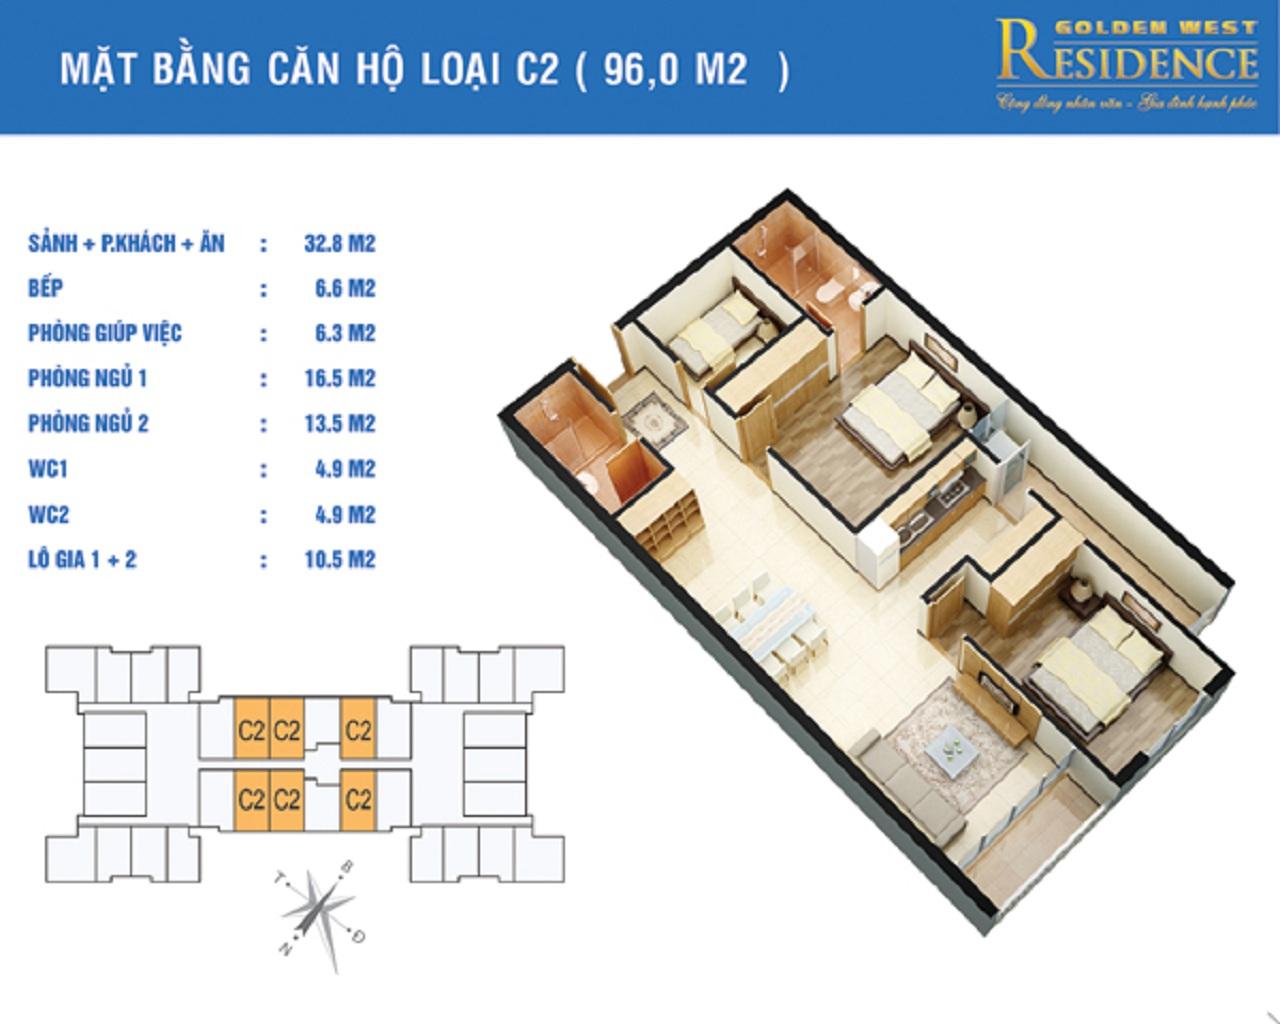 Chung Cư Golden West Residence